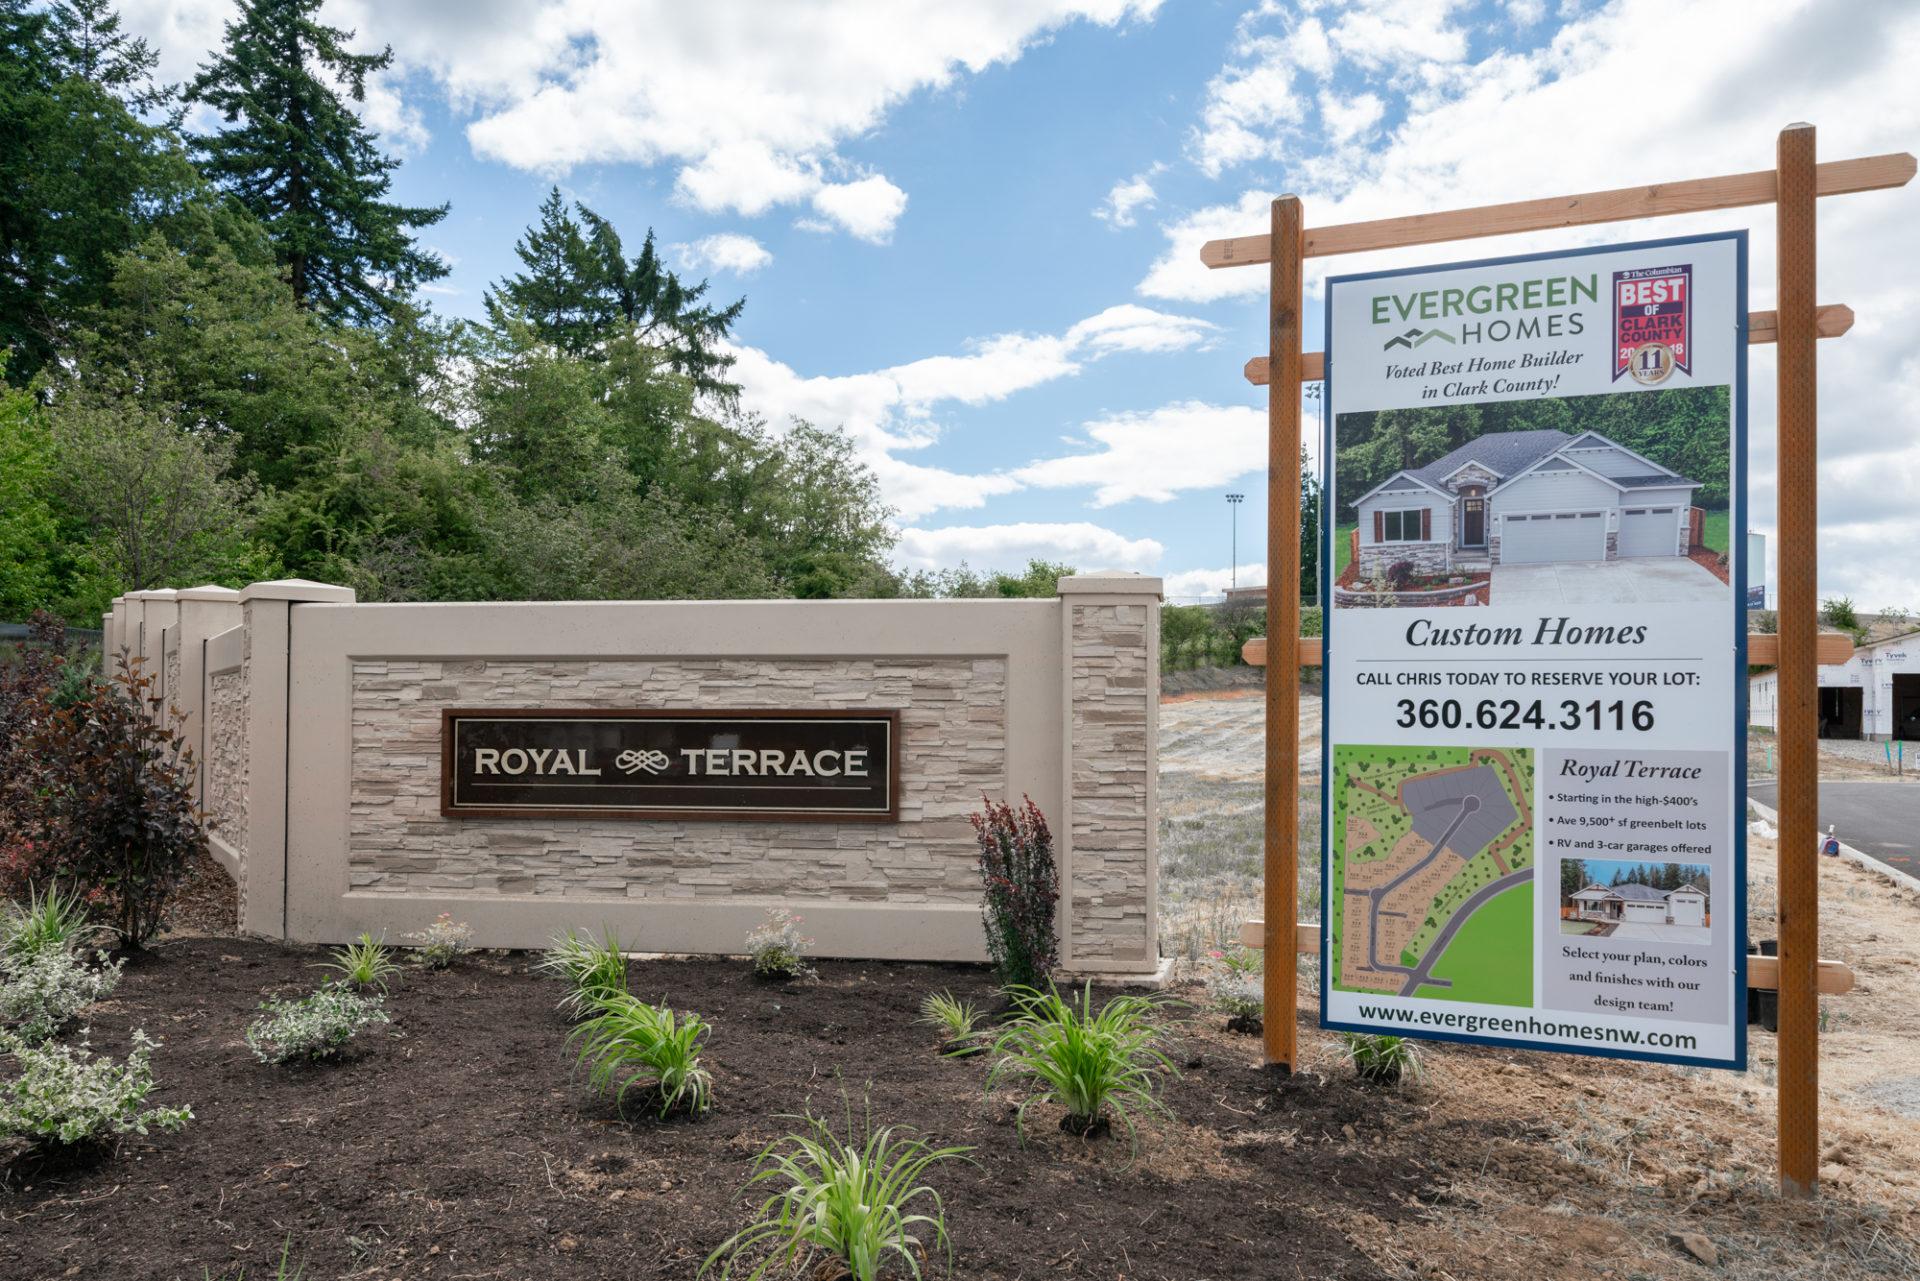 Evergreen Homes : Royal Terrace